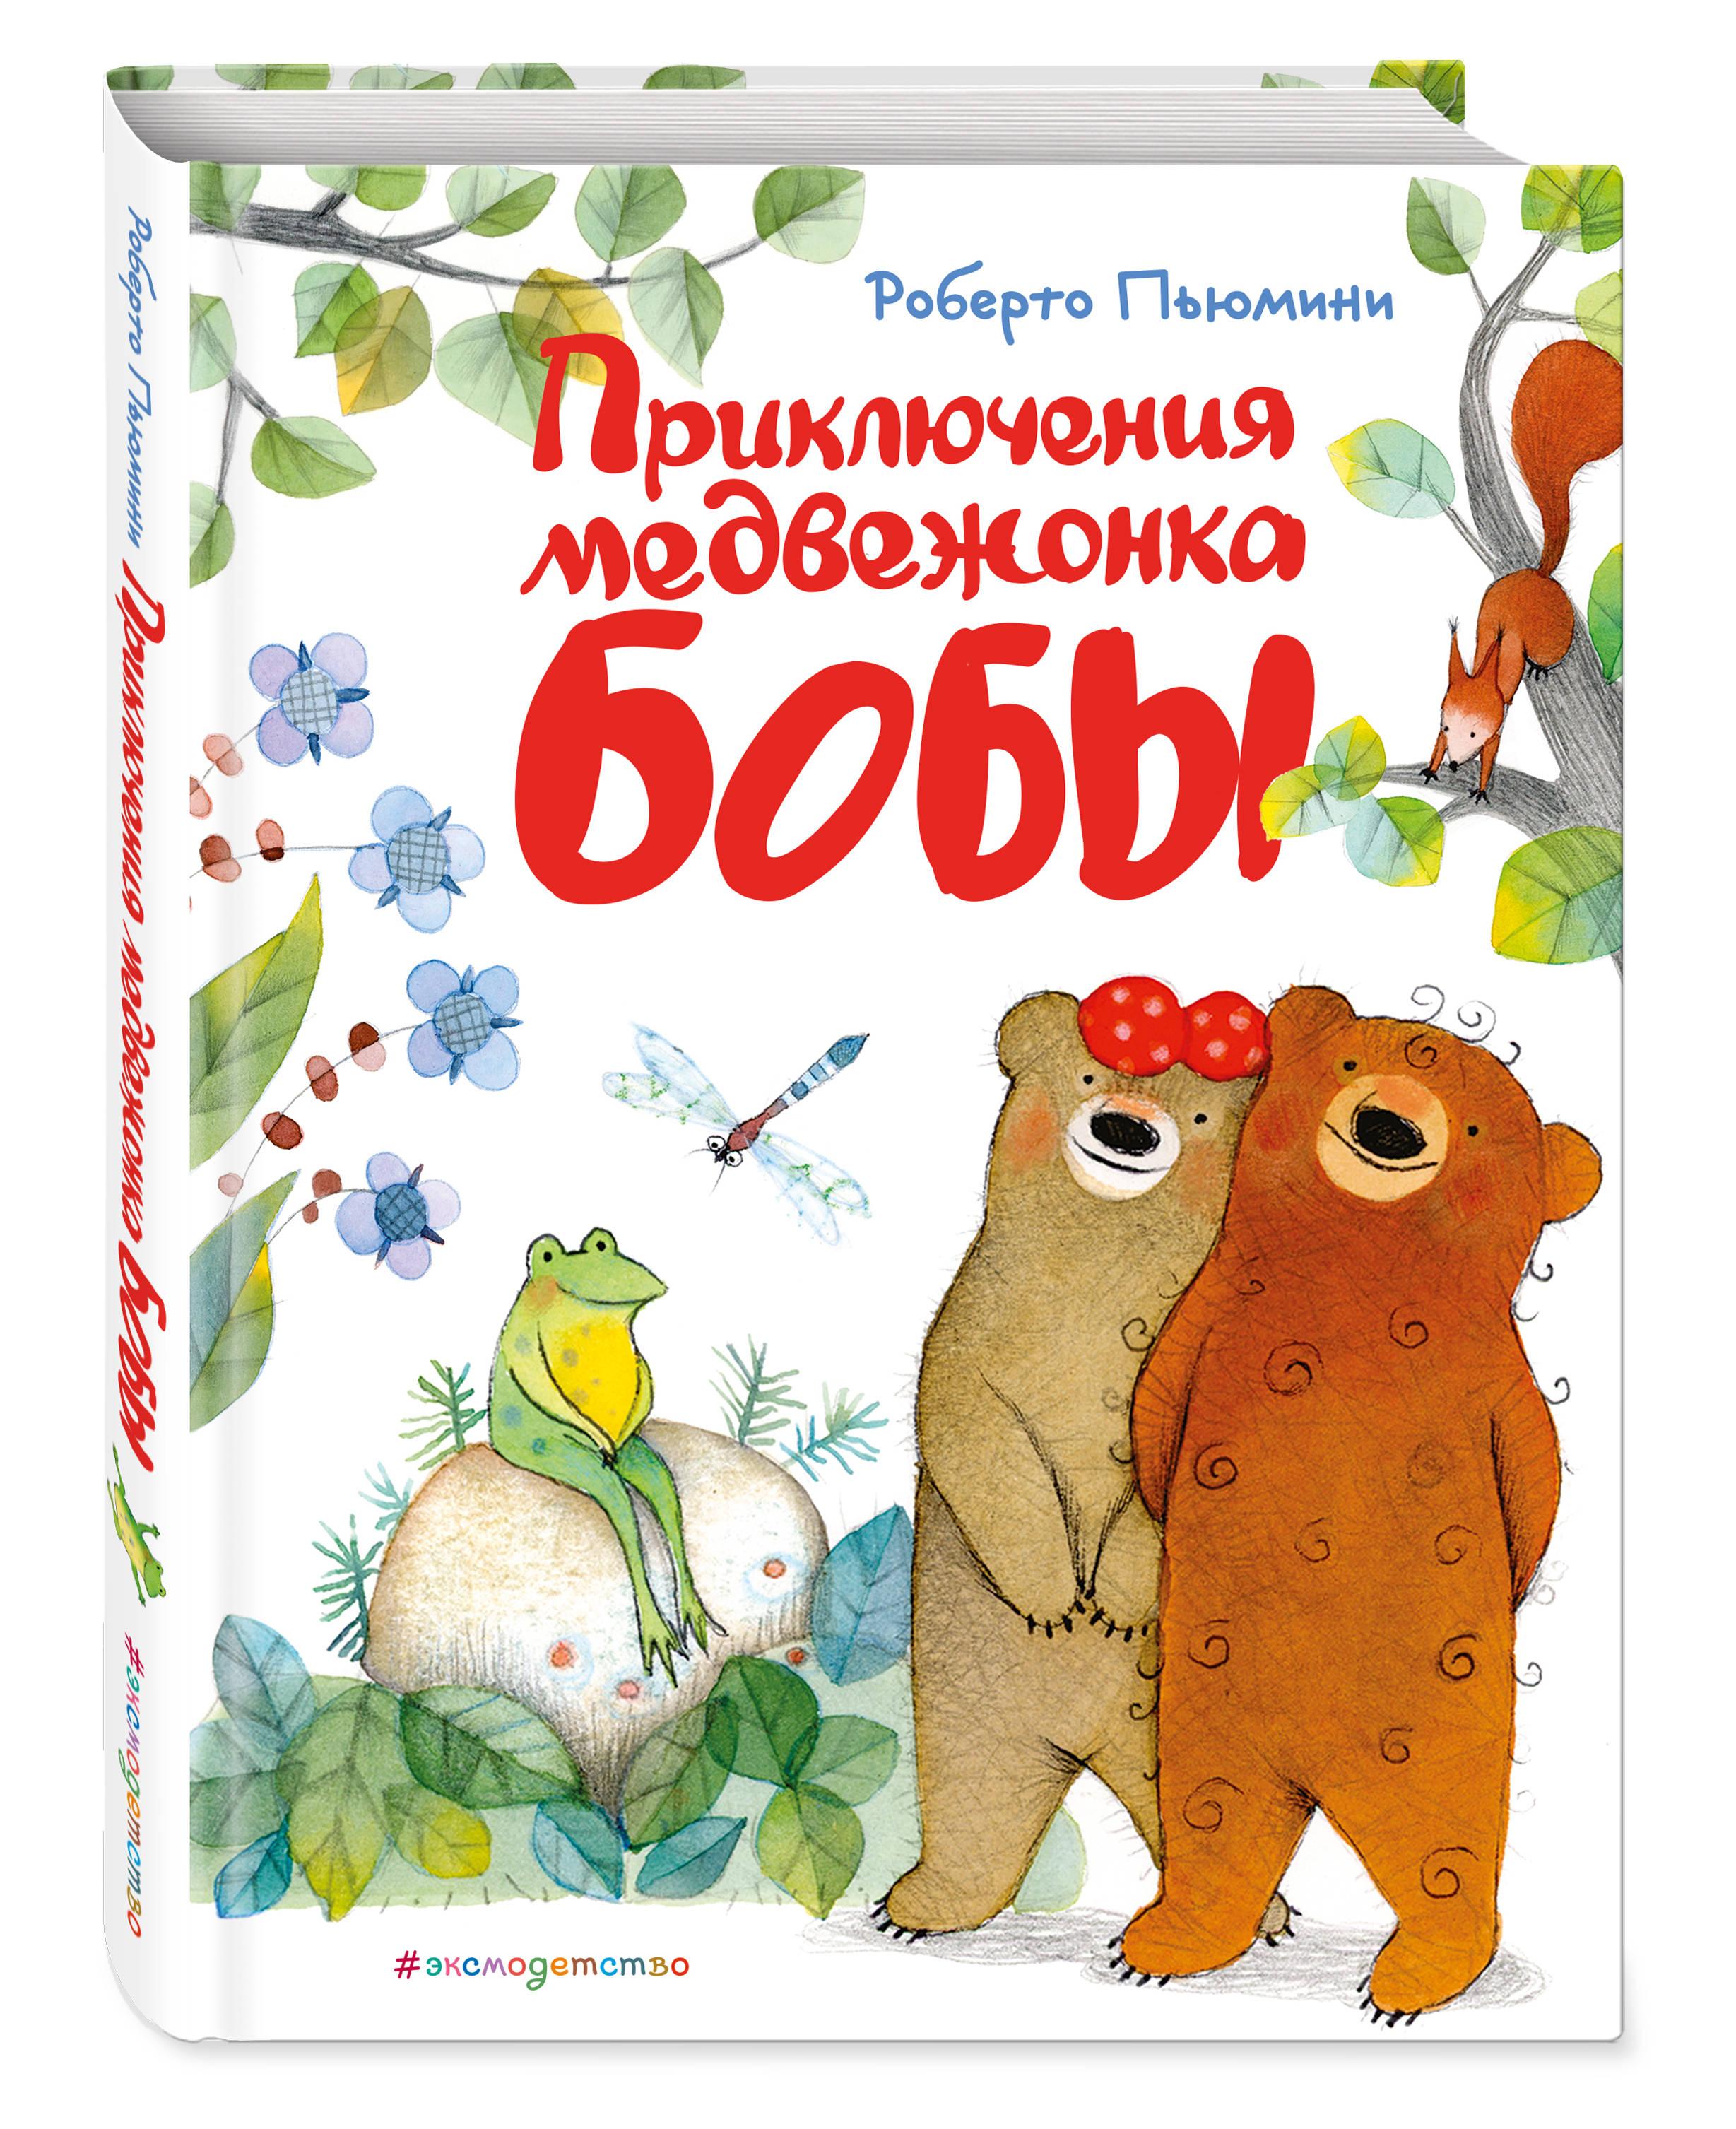 Роберто Пьюмини Приключения медвежонка Бобы (ил. А. Курти) цена 2017